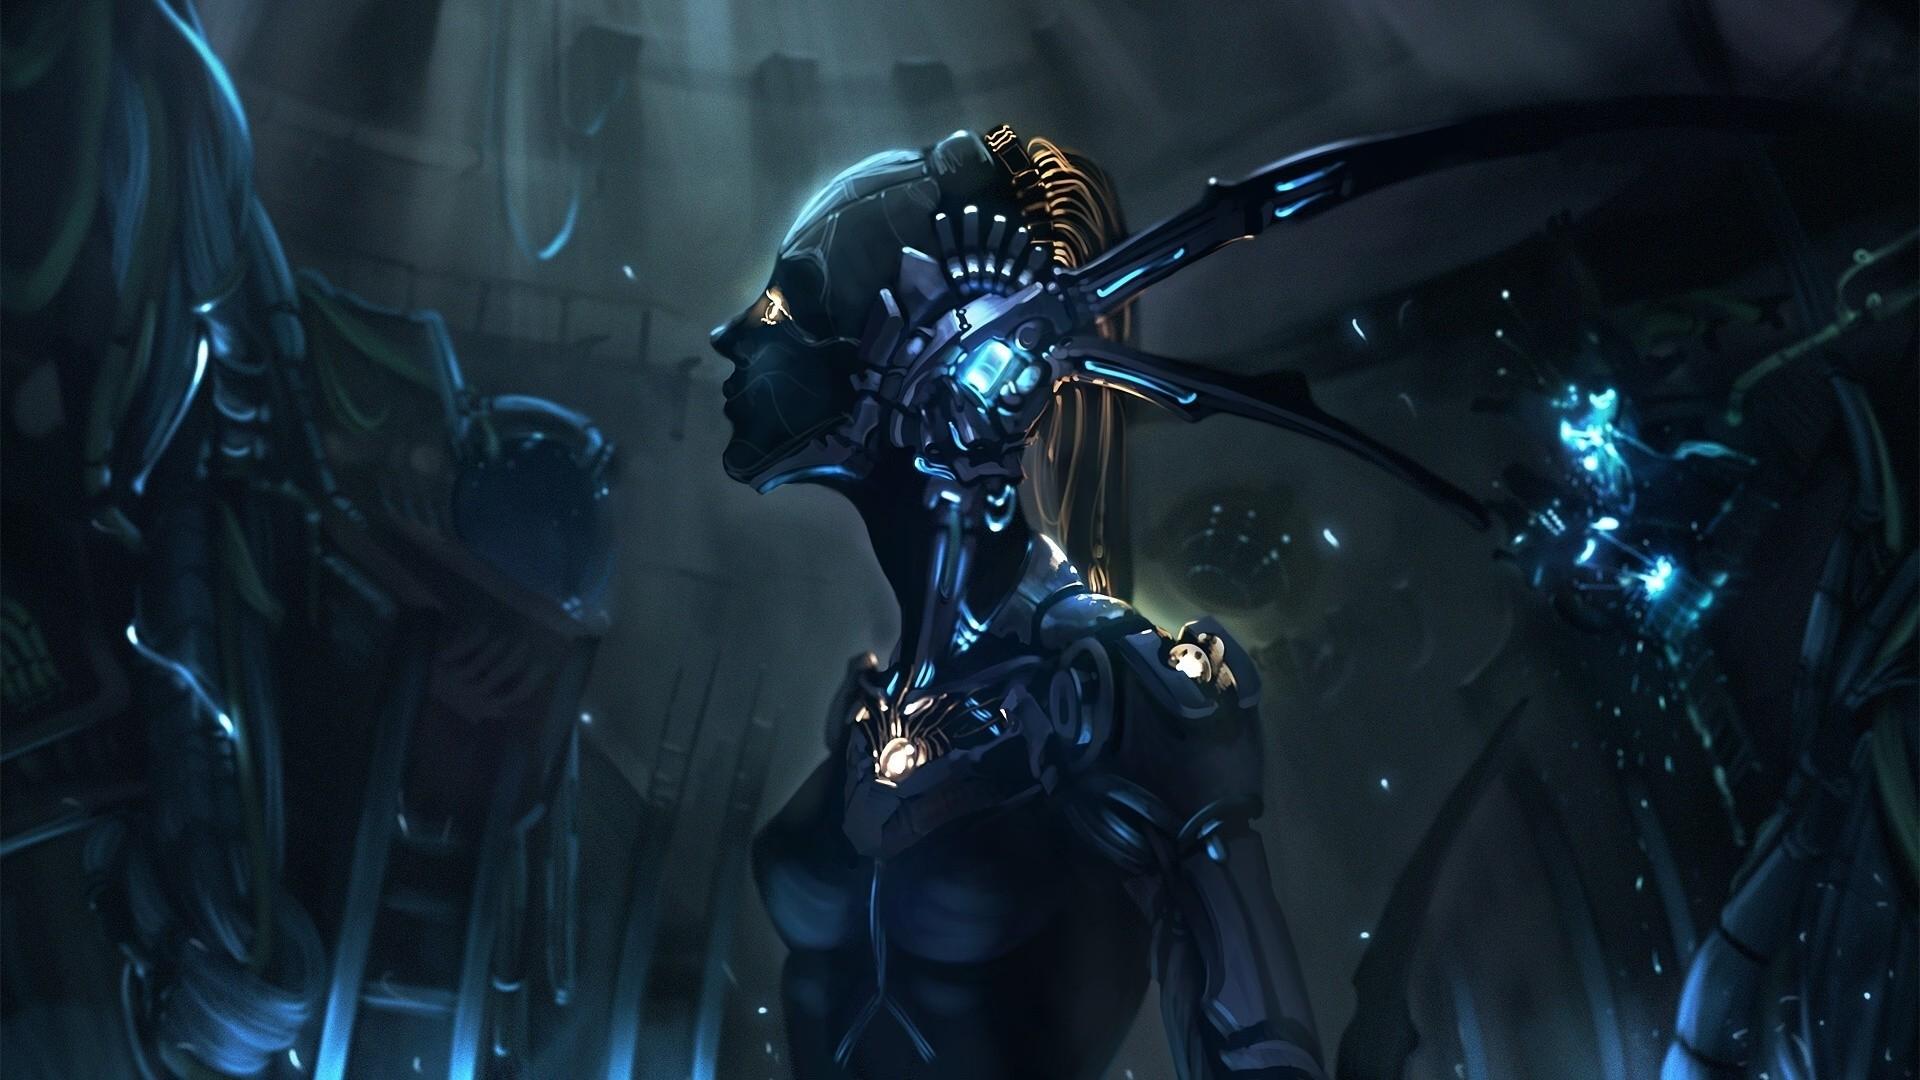 Cyborg Wallpaper HD